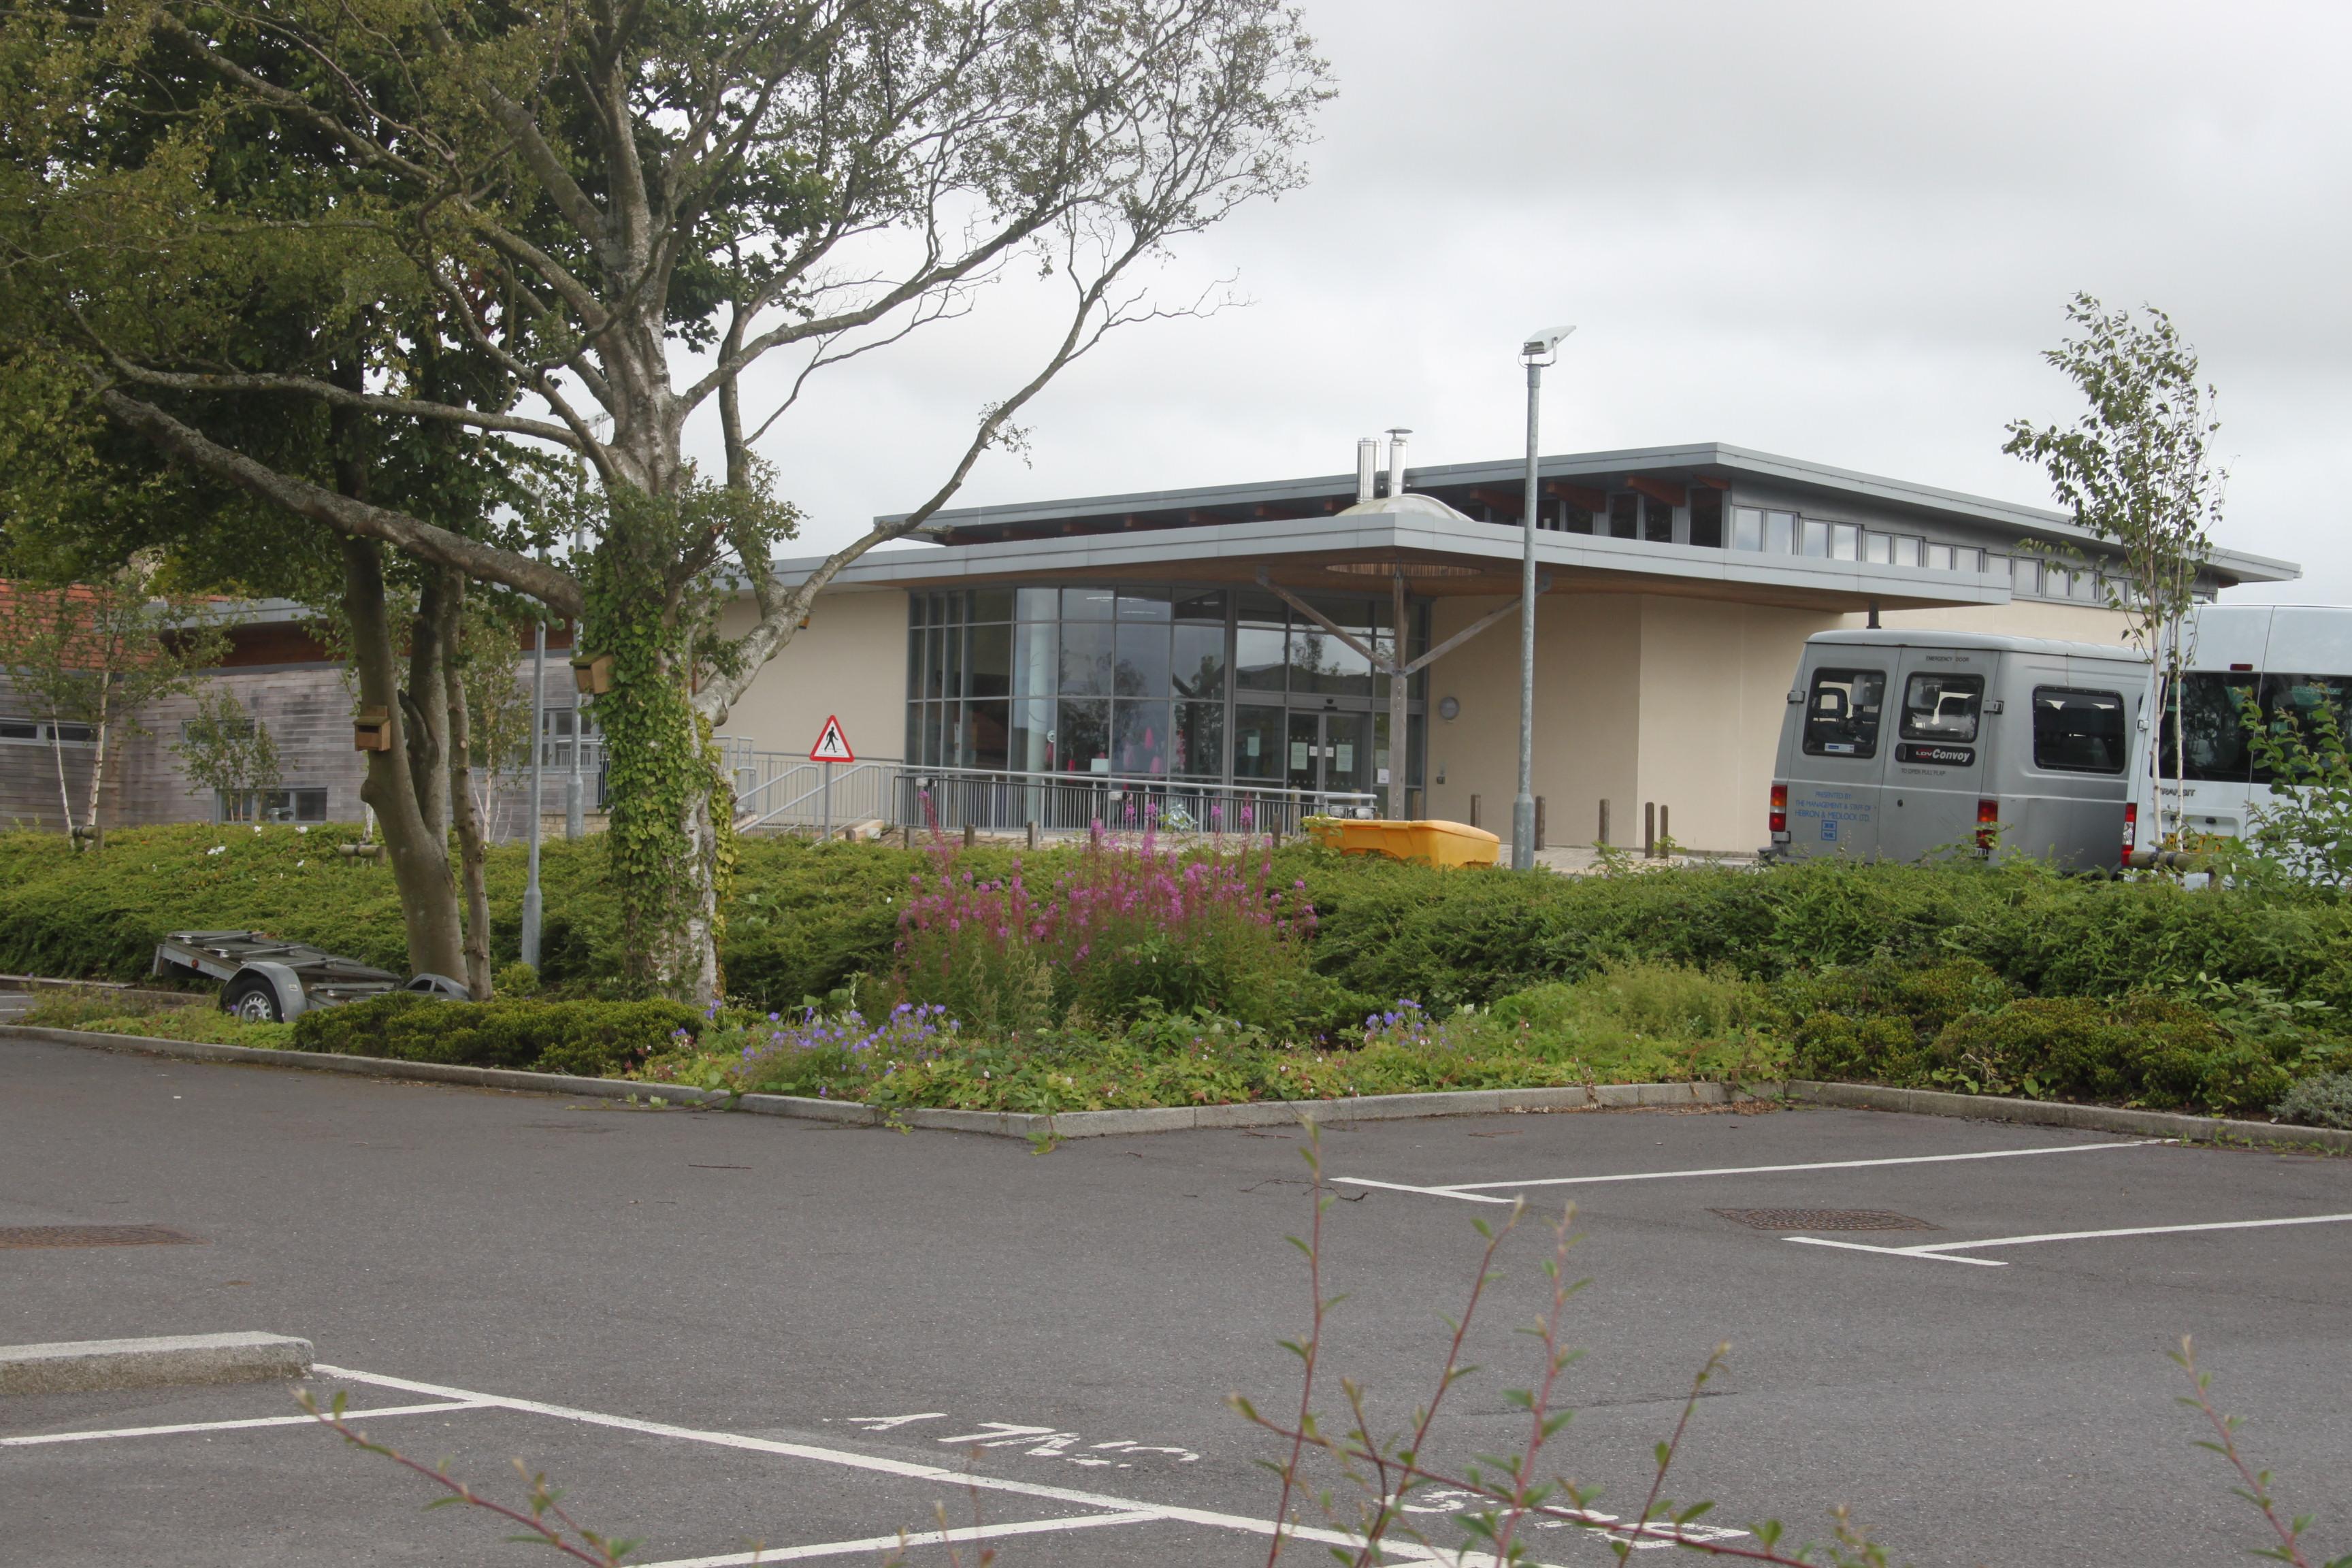 academy status located north - HD3456×2304